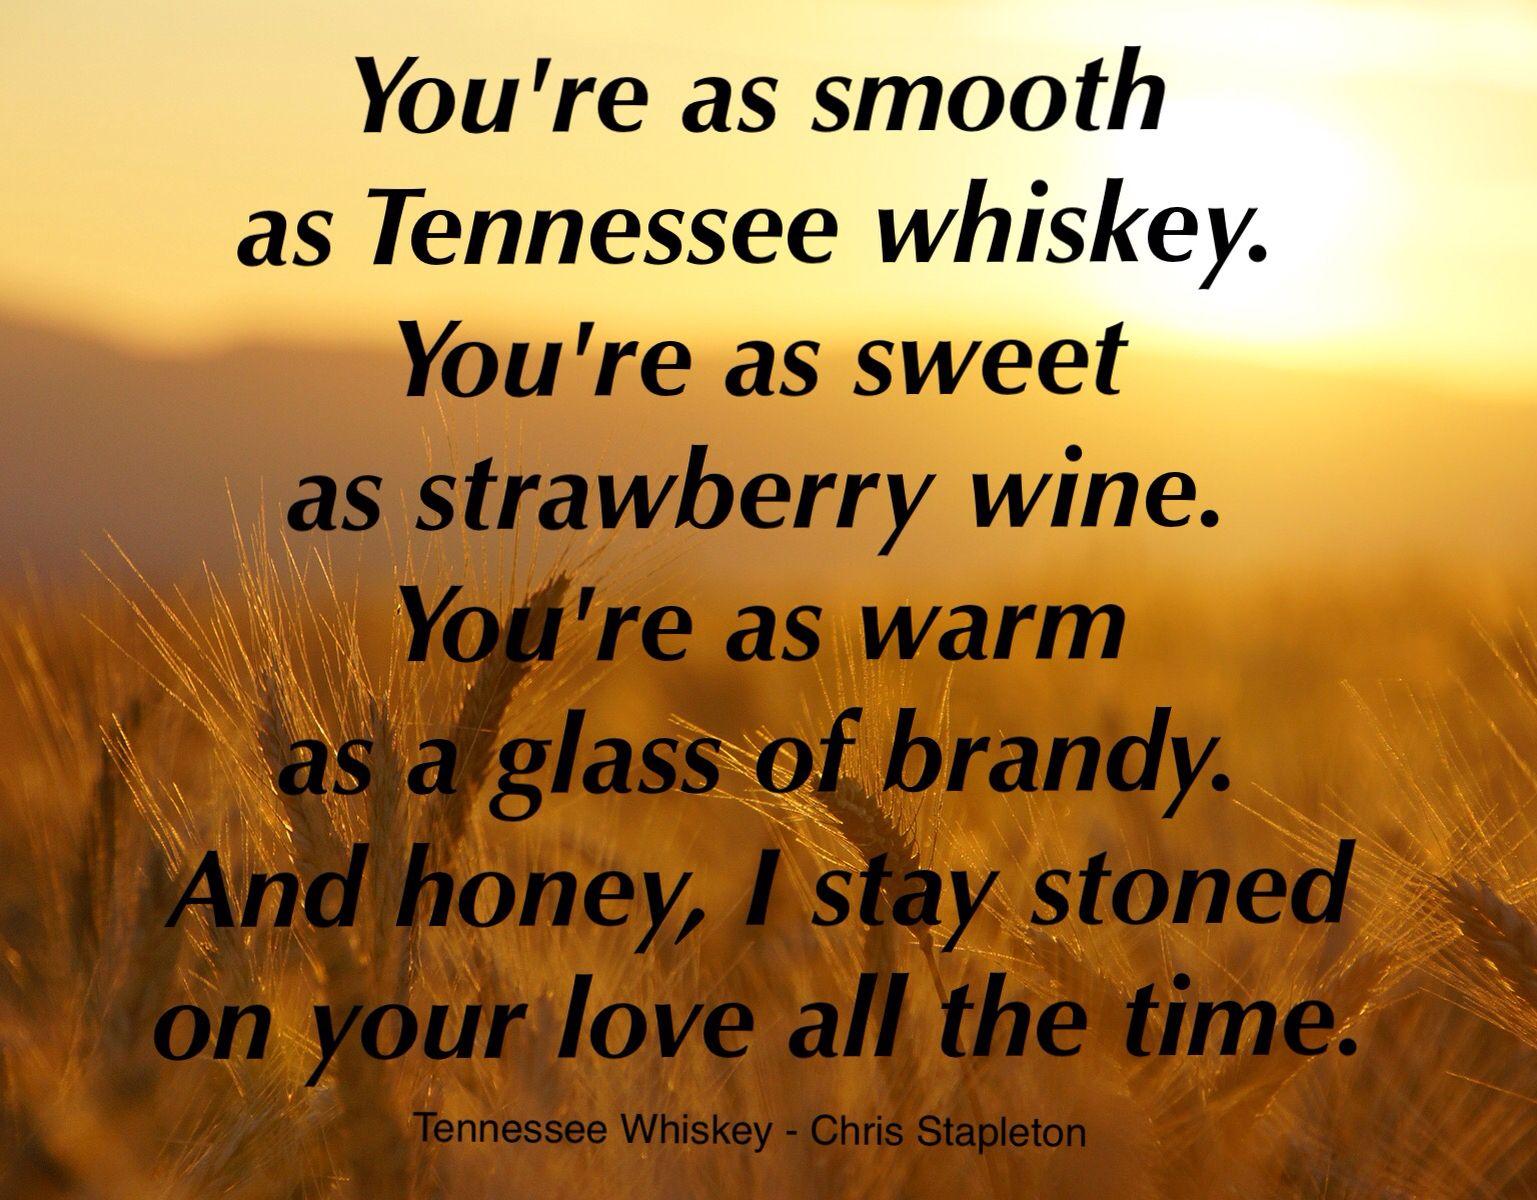 Best 25 george jones ideas on pinterest mrs jones song tammy tennessee whiskey chris stapletongeorge jones hexwebz Image collections